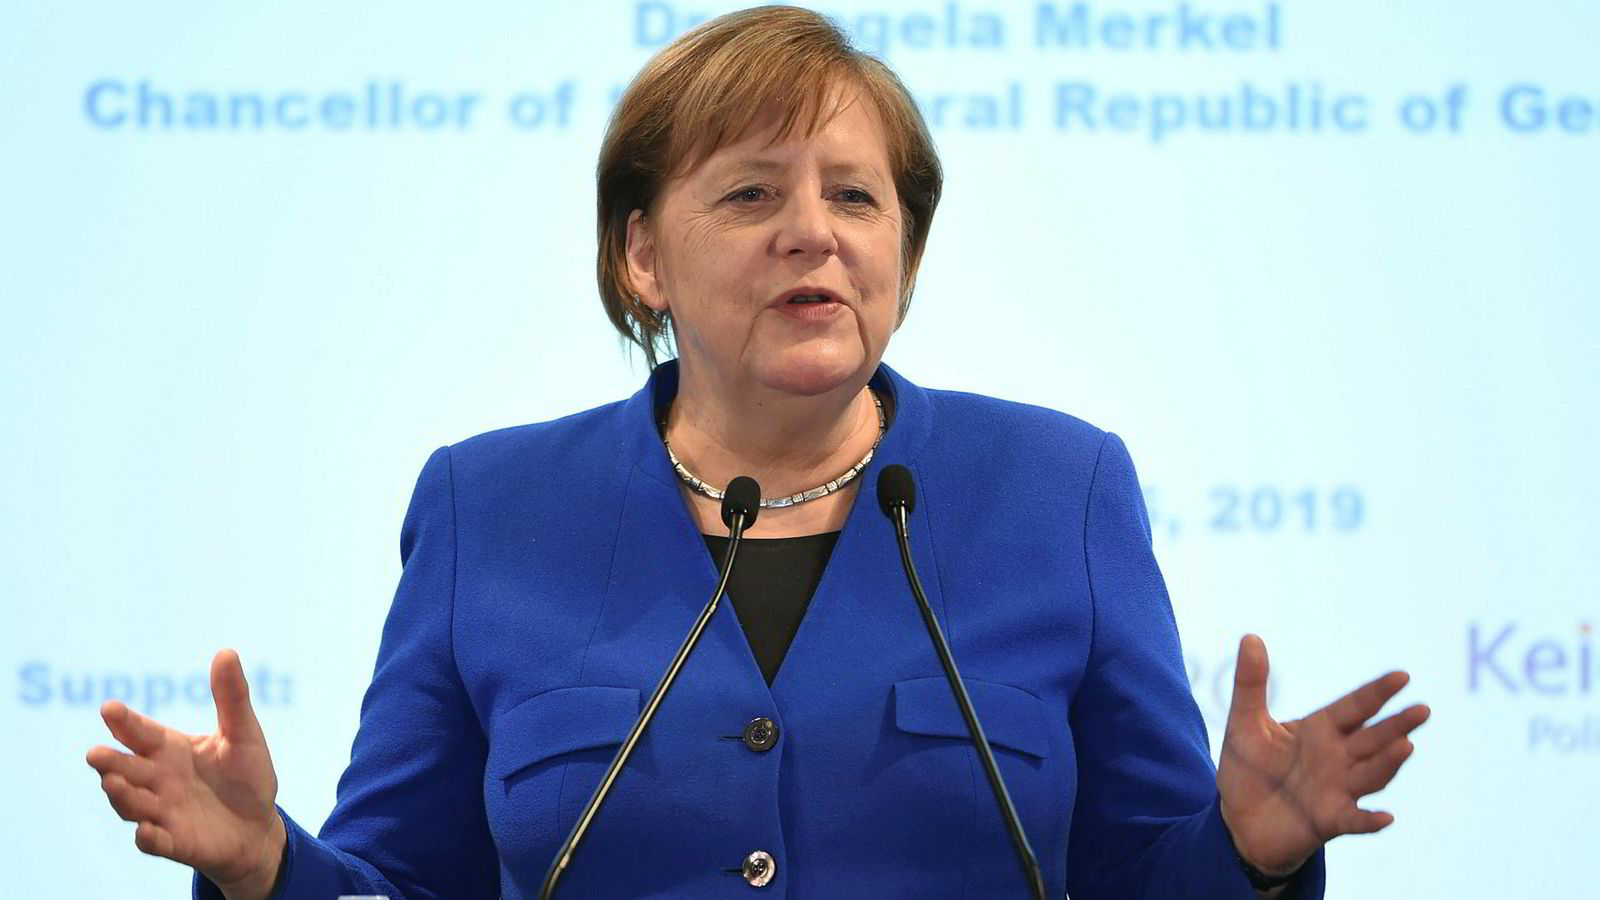 Tysklands kansler Angela Merkel talte på et universitet i Tokyo tirsdag.